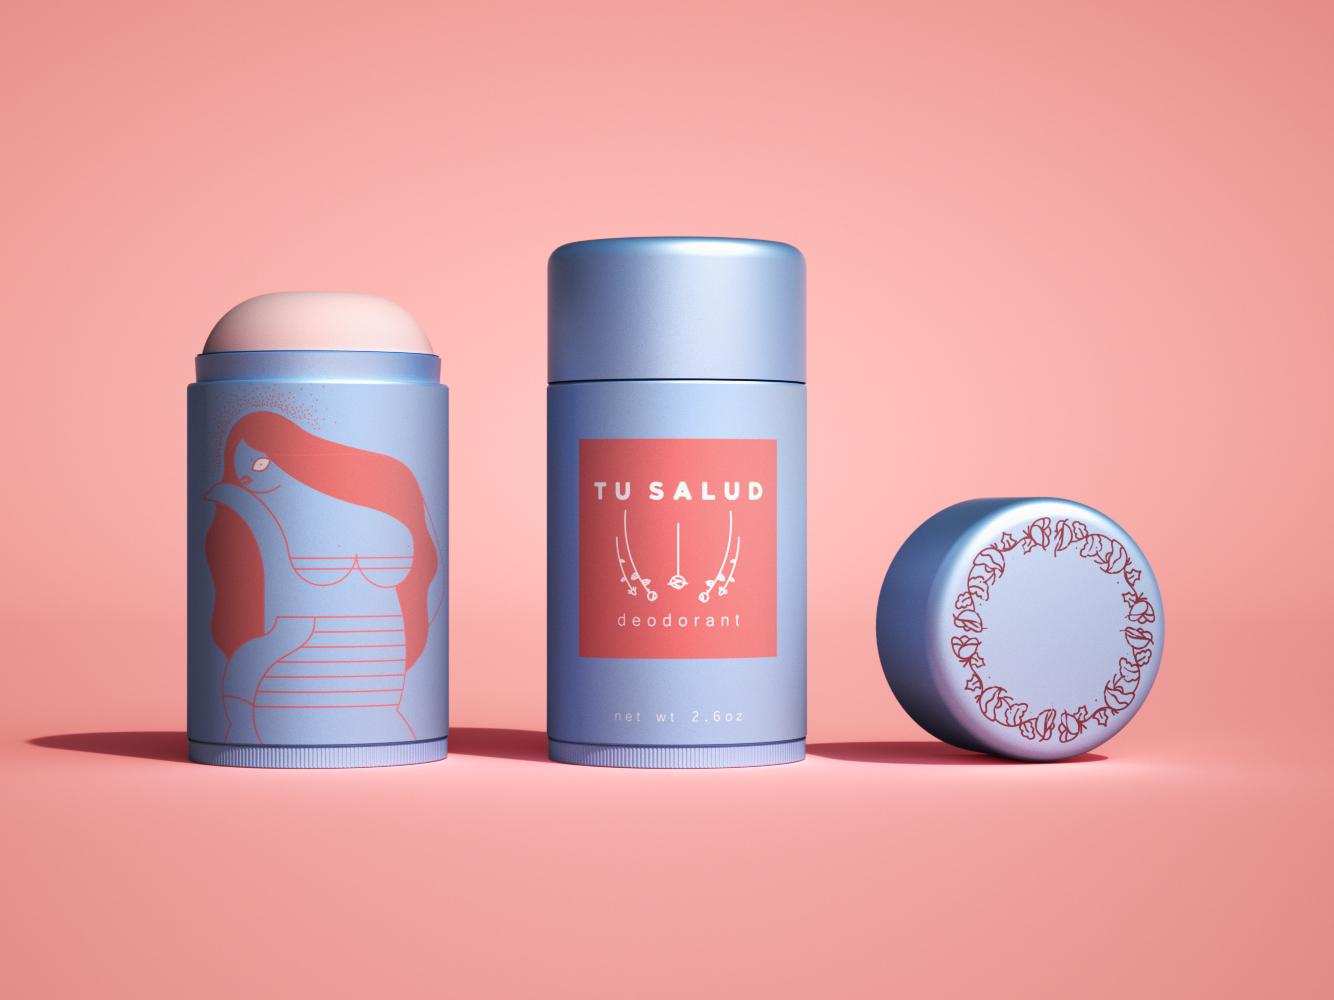 Tu Salud deodorant illustration photoshop design logo branding packaging package design